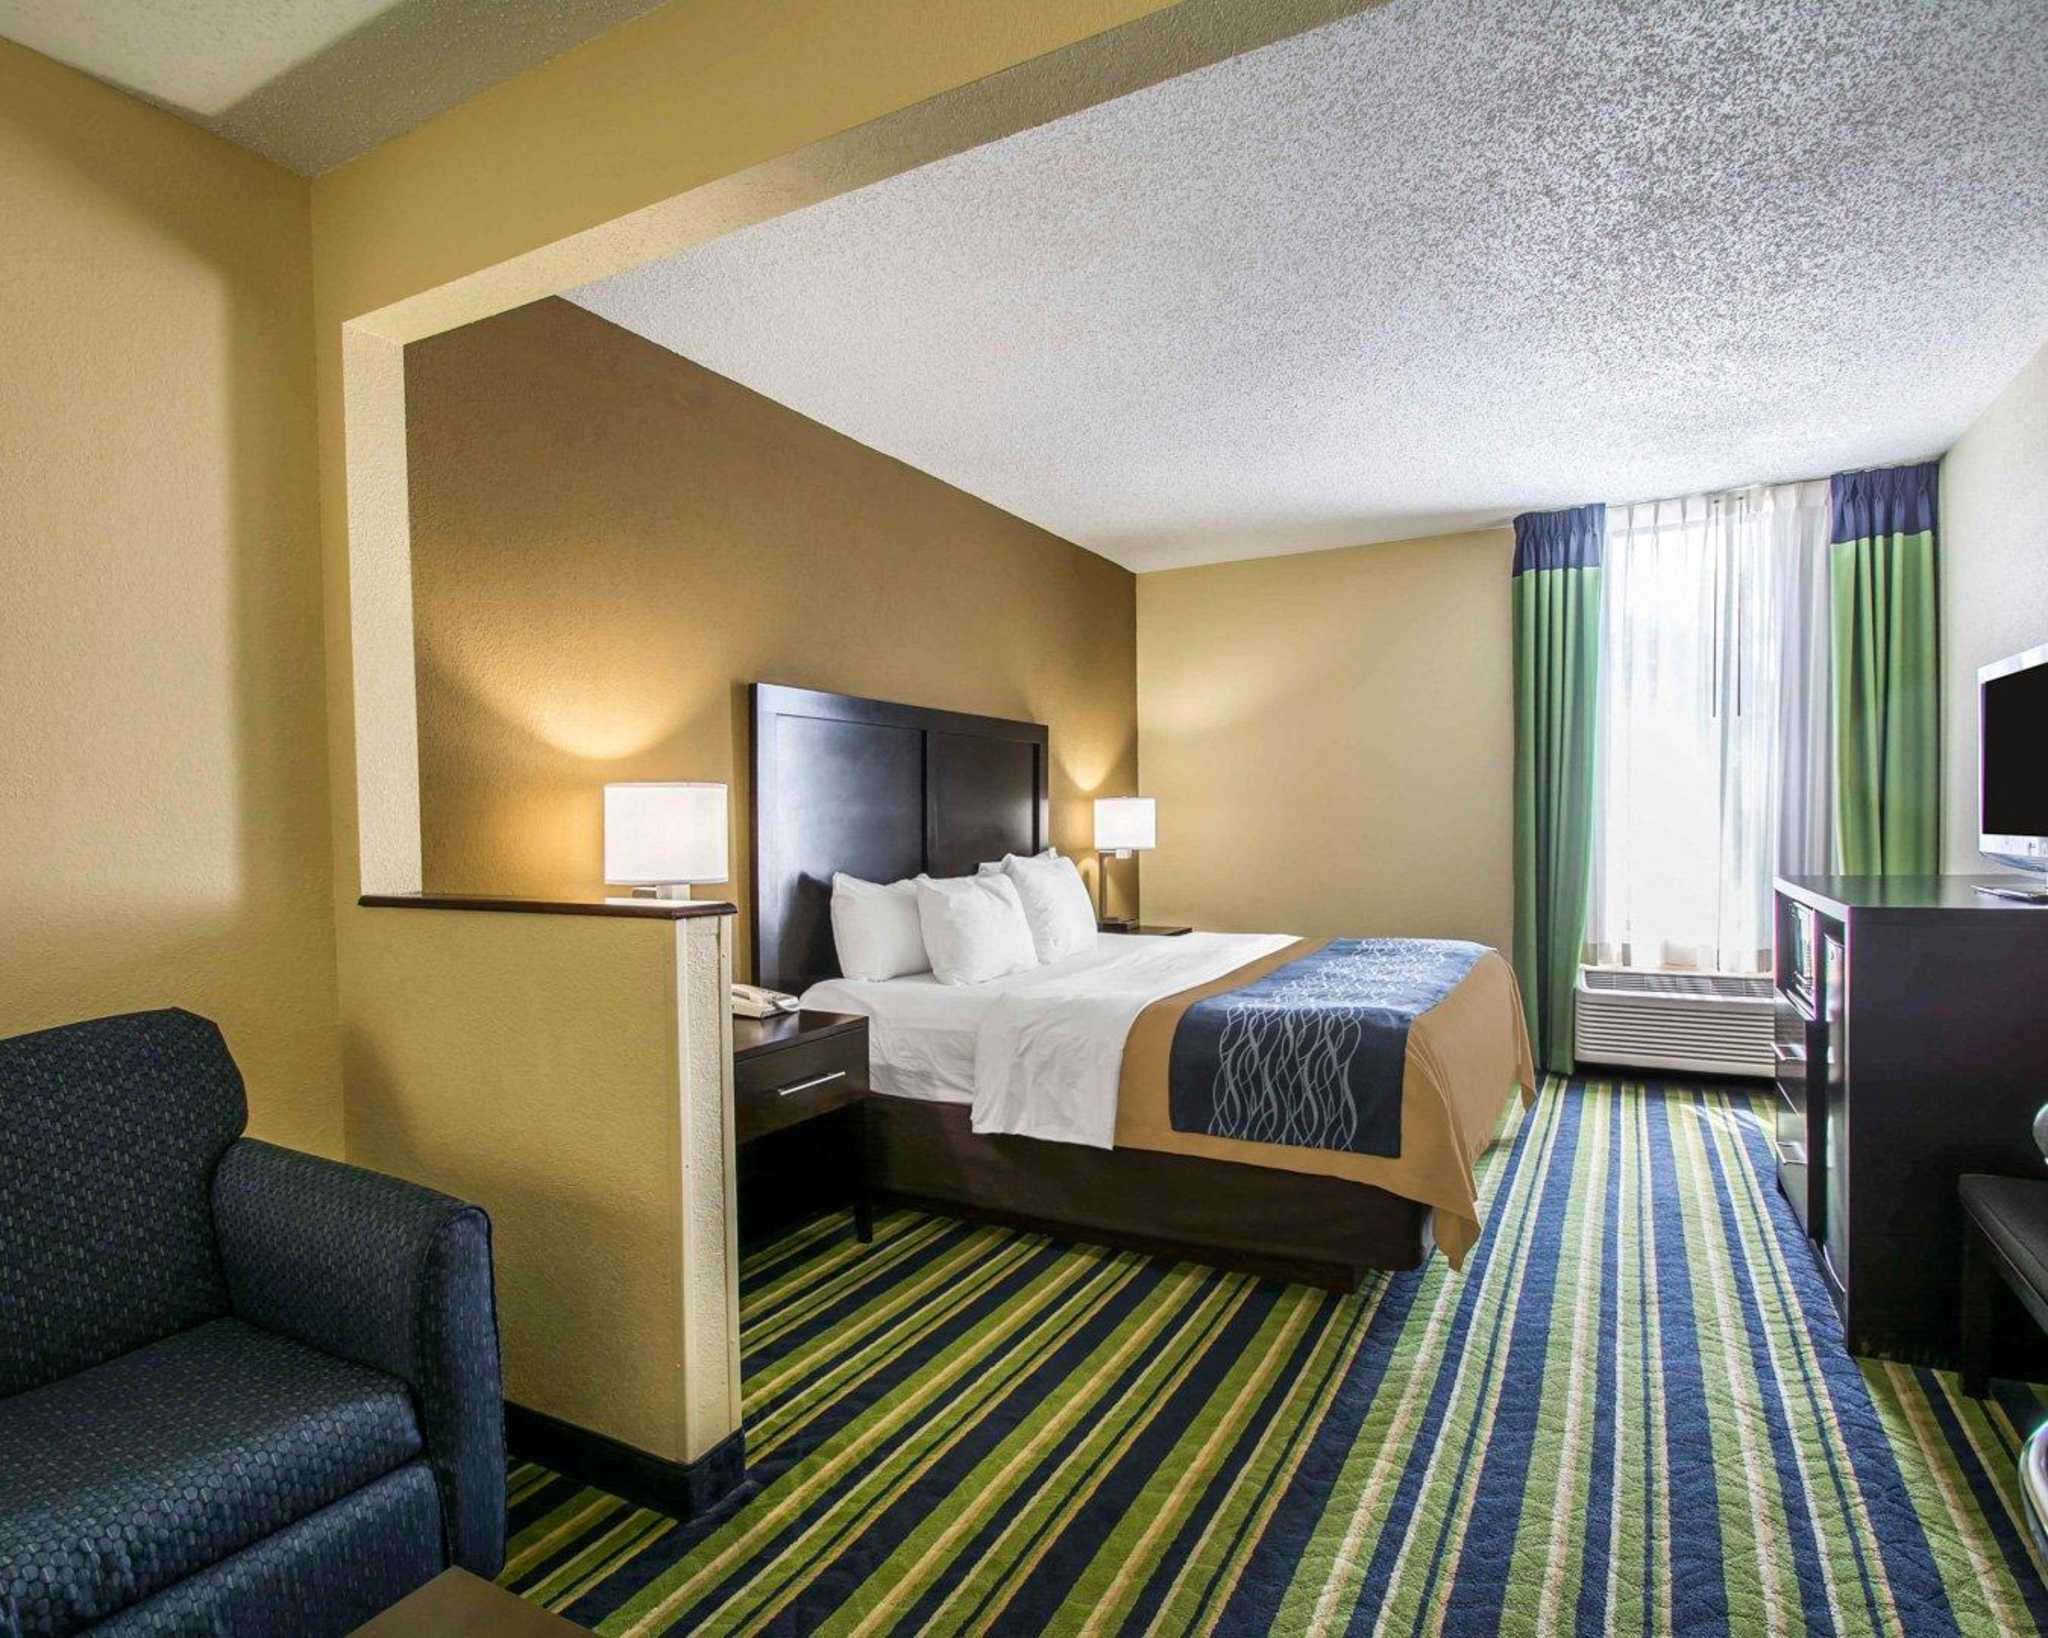 Comfort Inn & Suites Lantana - West Palm Beach South image 25